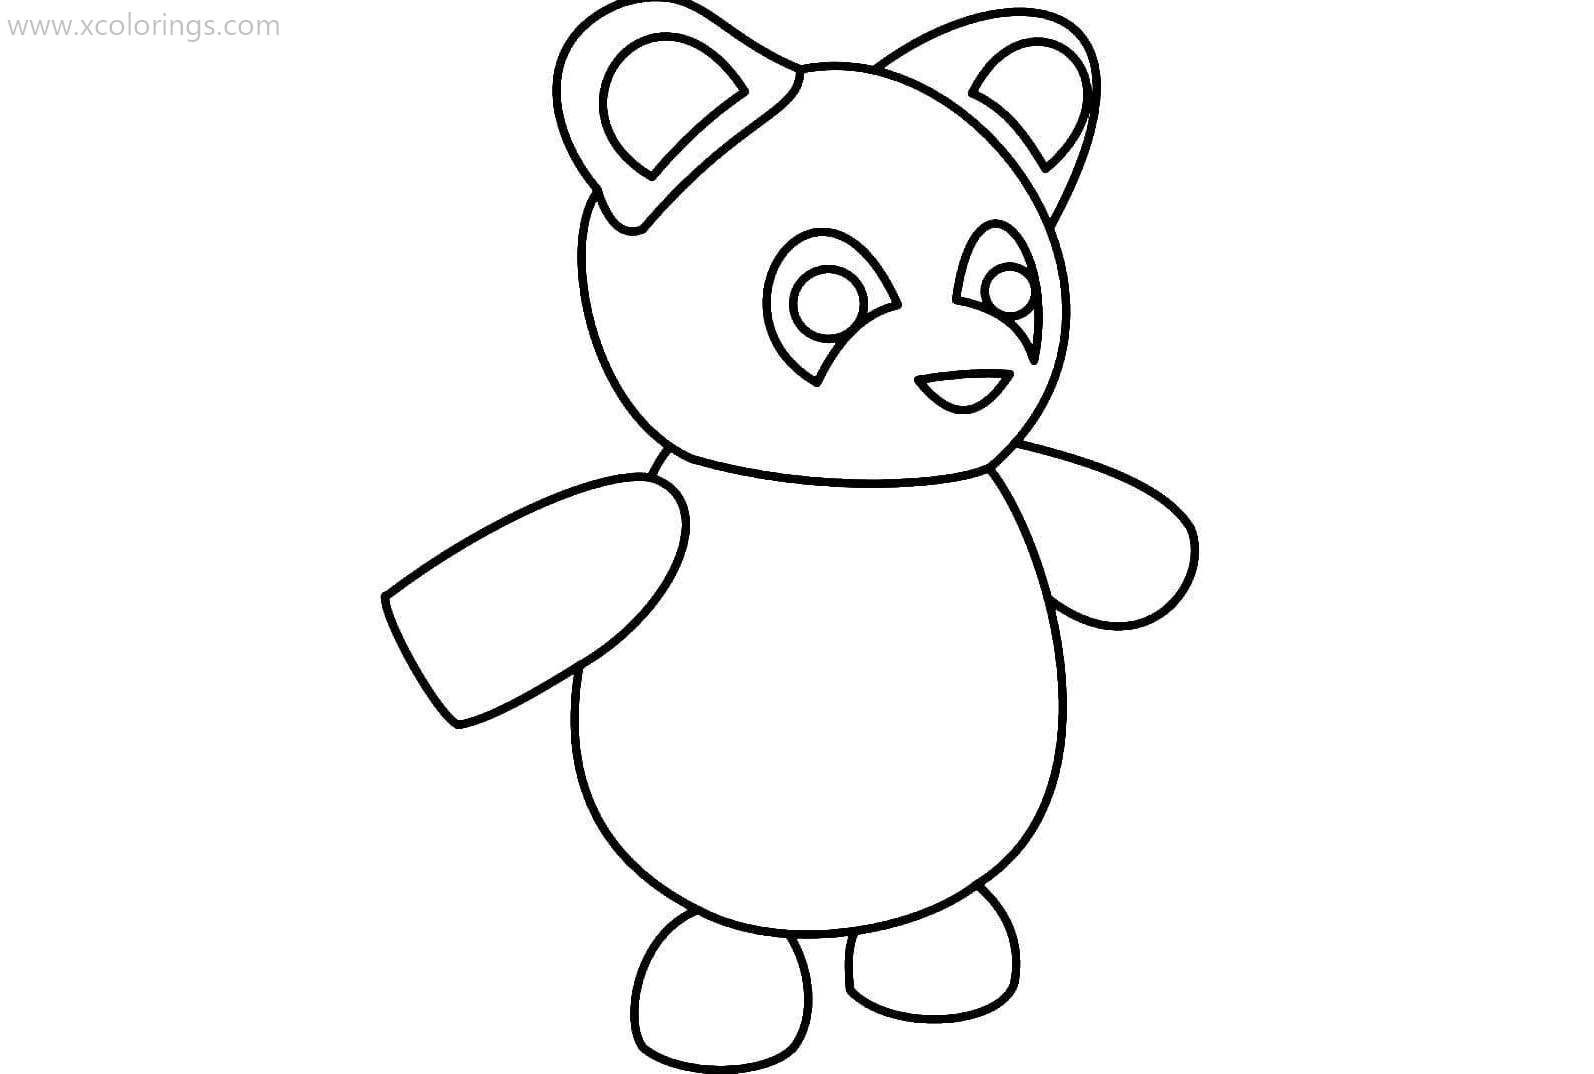 Roblox Adopt Me Coloring Pages Panda Pets Drawing Coloring Pages Coloring Pages For Kids